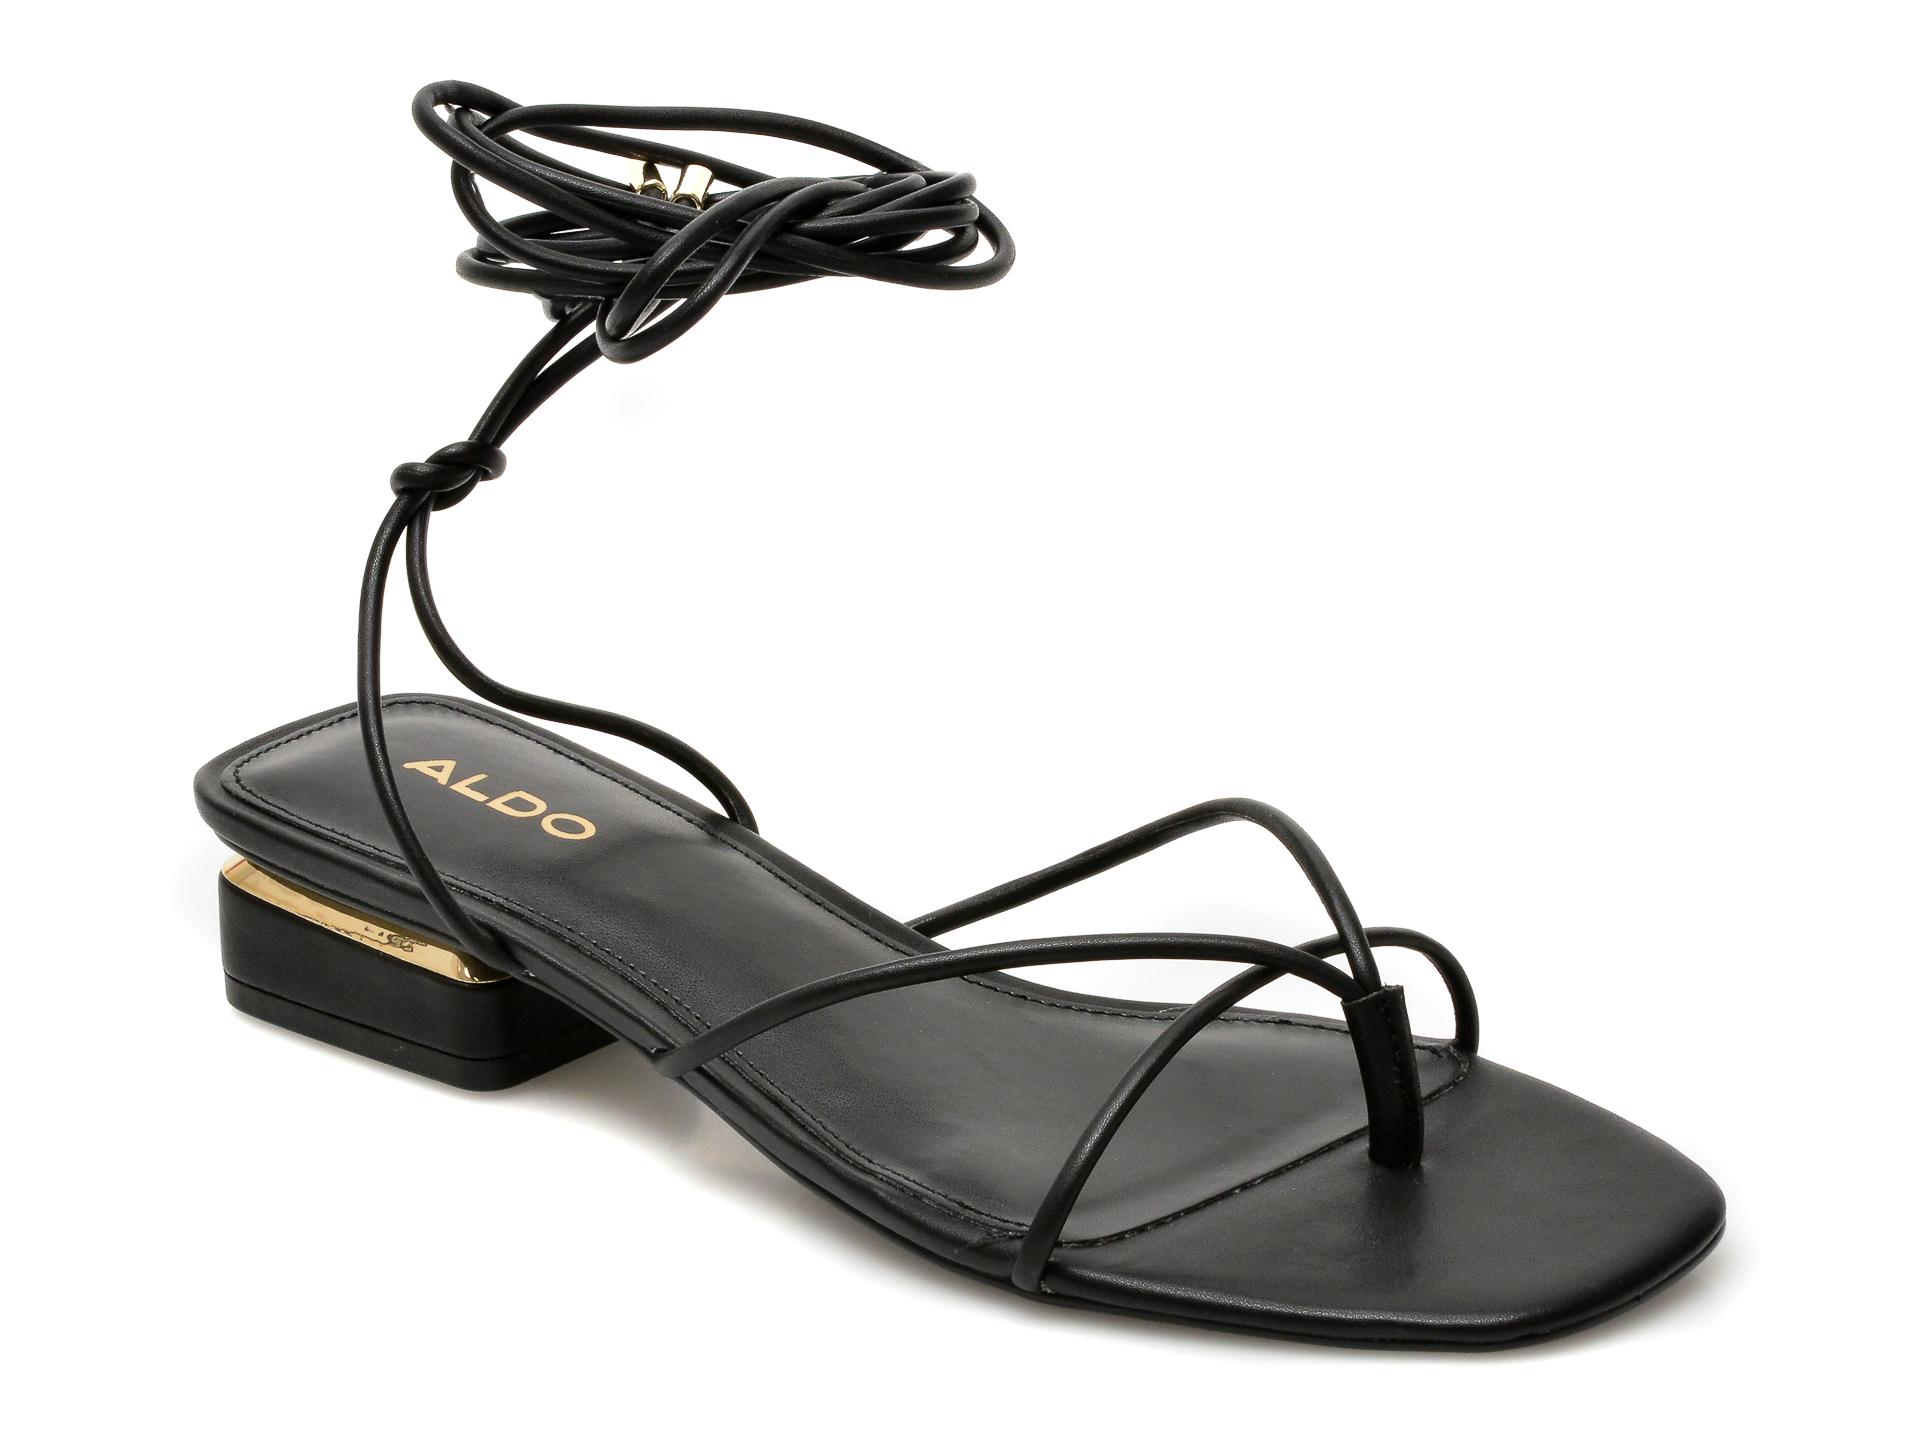 Sandale ALDO negre, Giannaflex001, din piele ecologica imagine otter.ro 2021